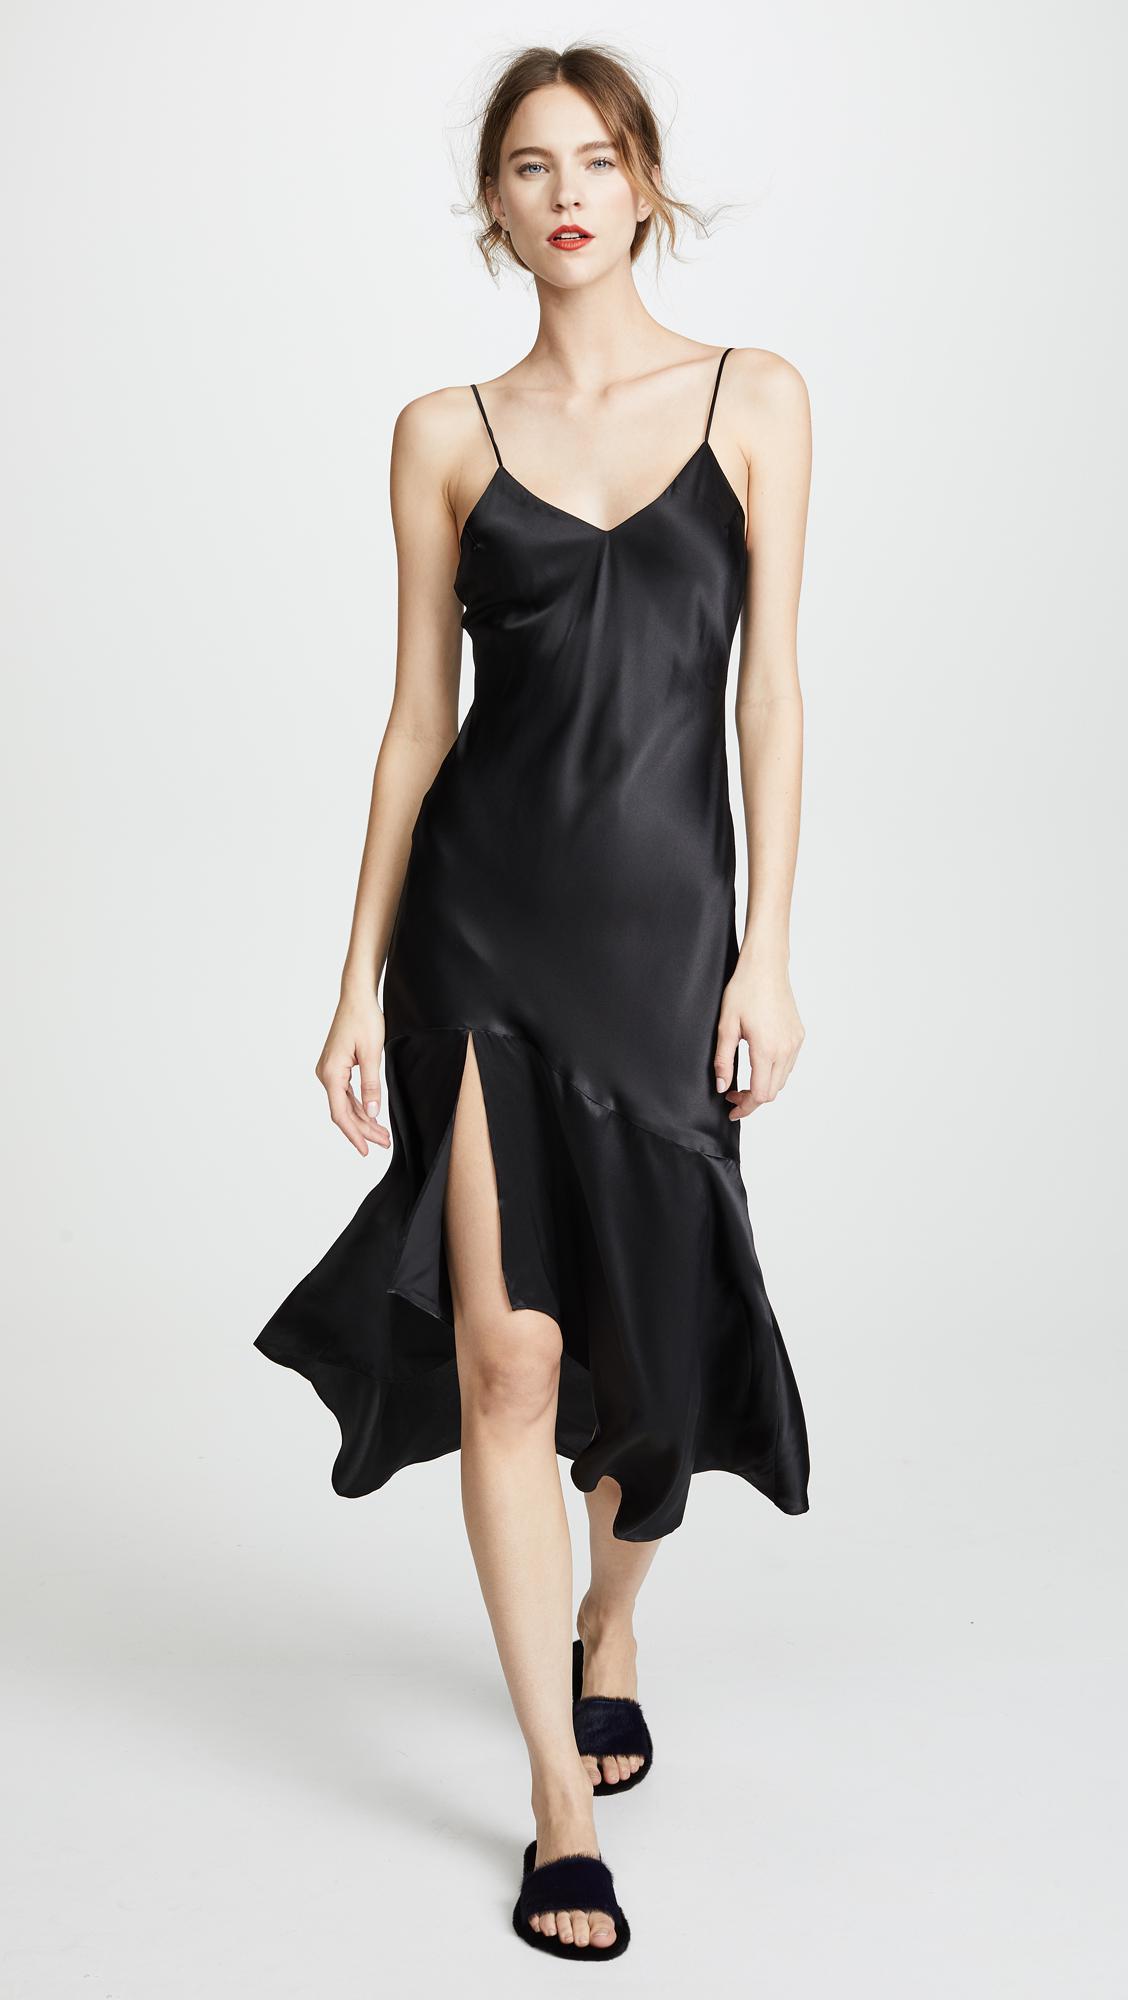 Lyst - Cami Nyc The Sandra Dress in Black